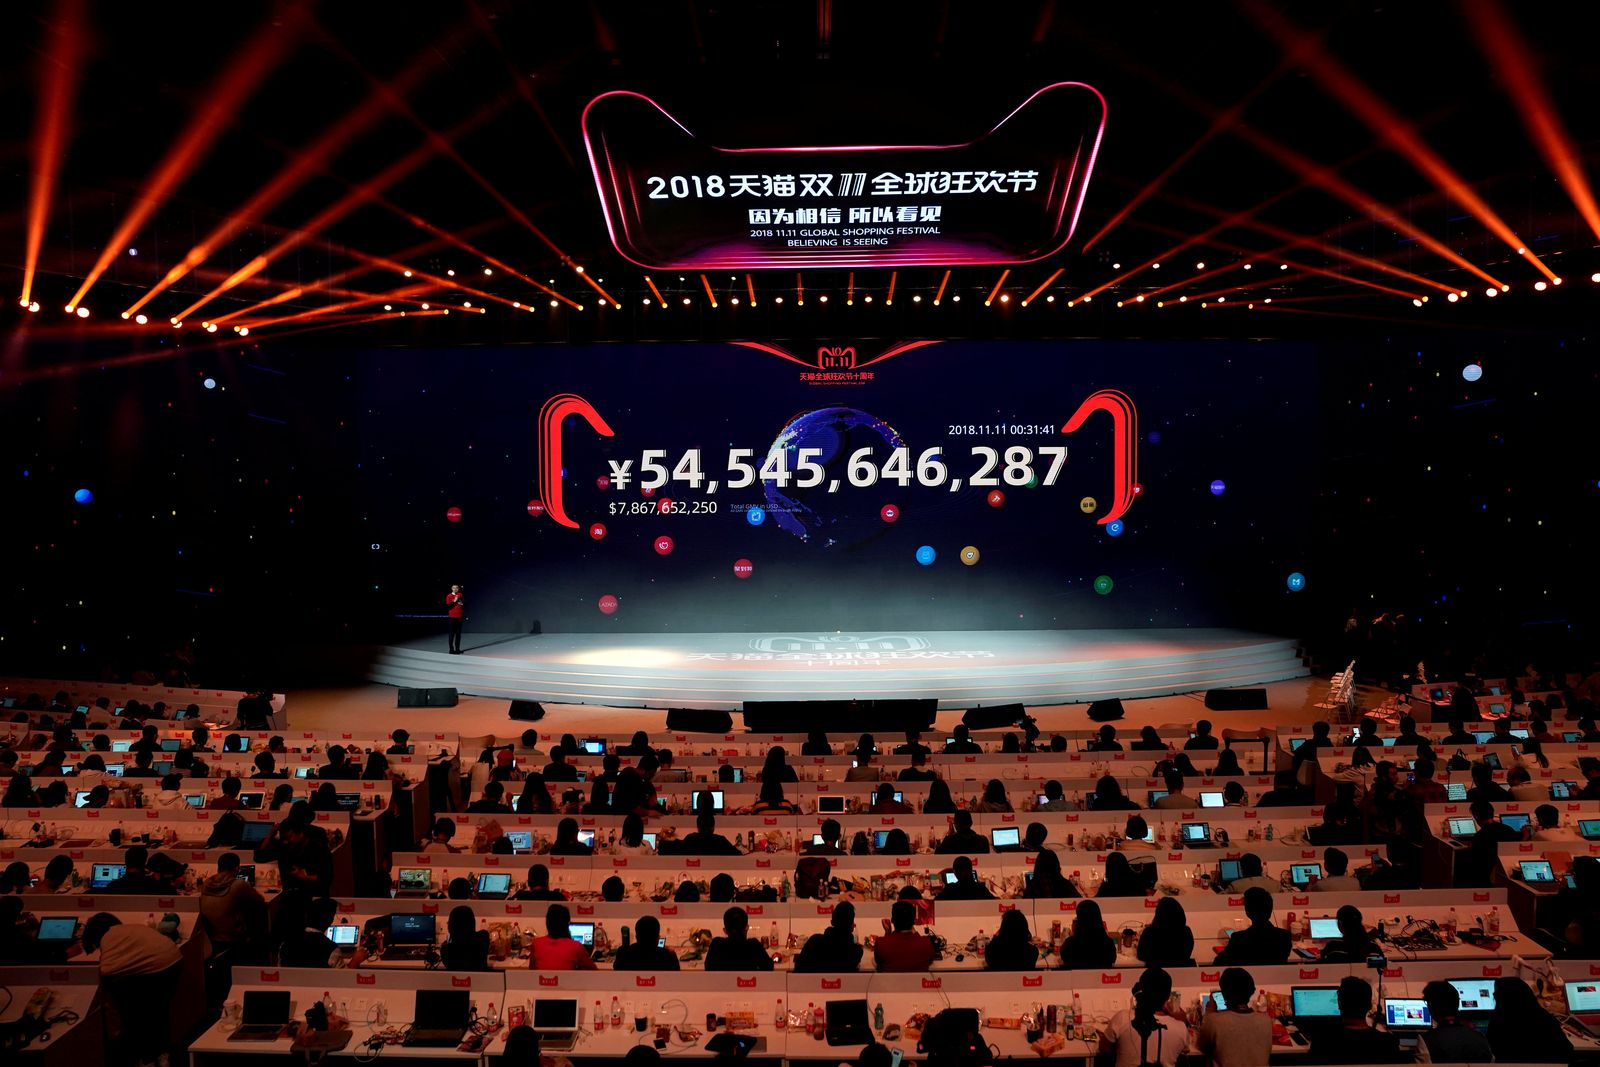 singles-day 2018/ Alibaba